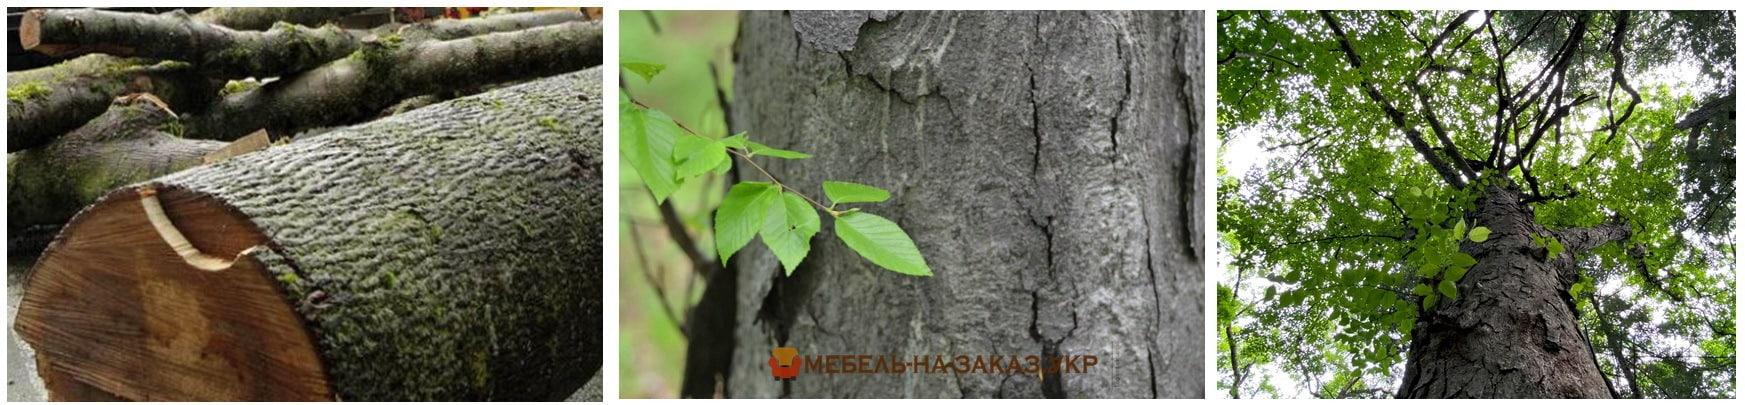 дерево берёзы Шмидта